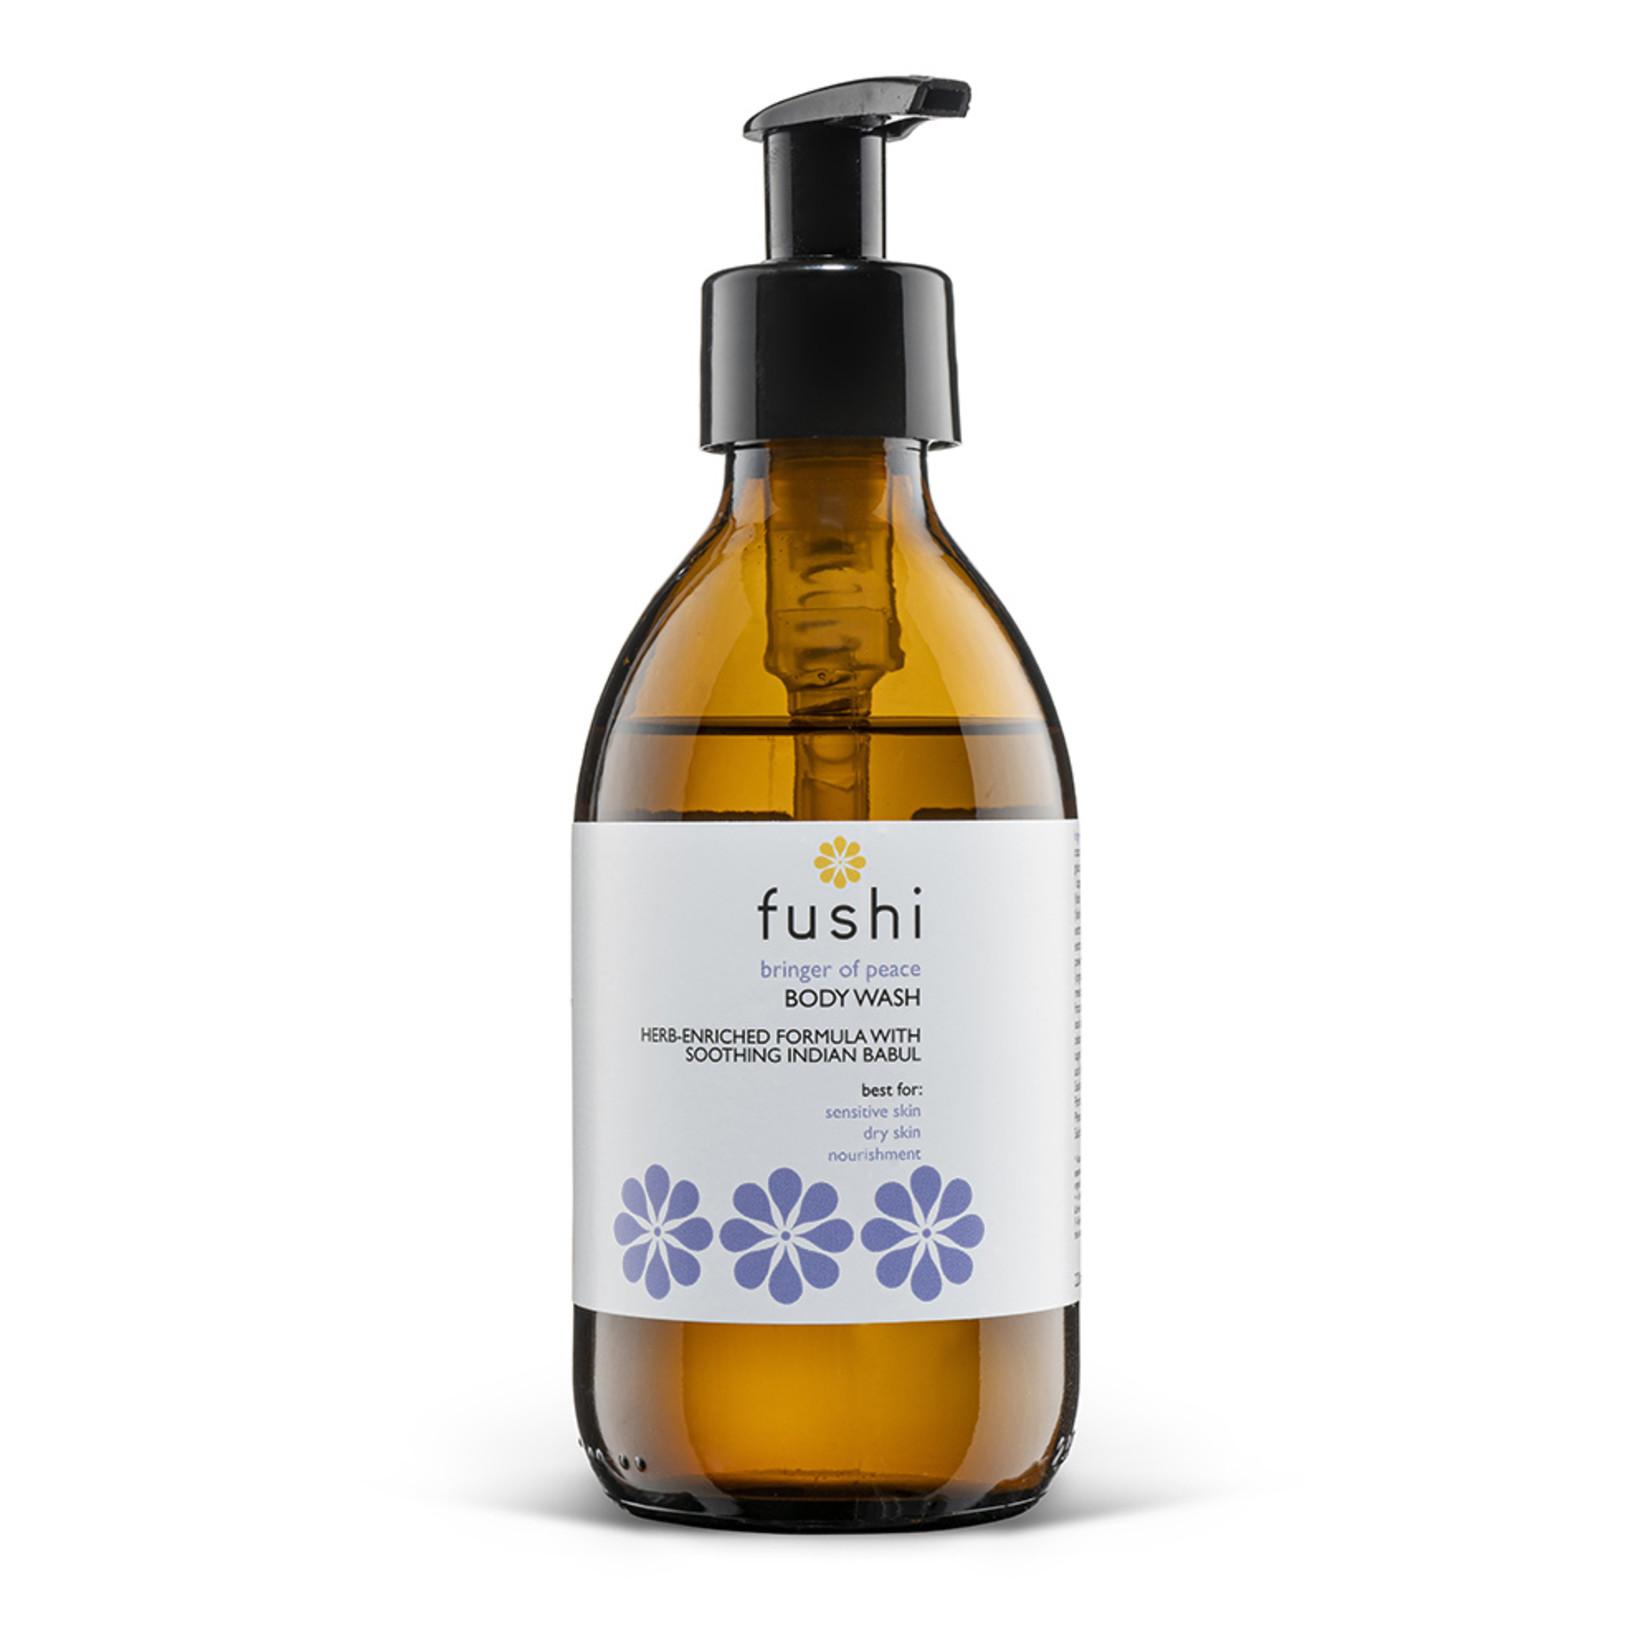 Fushi FUSHI - Bringer of Peace Body Wash - 230ml